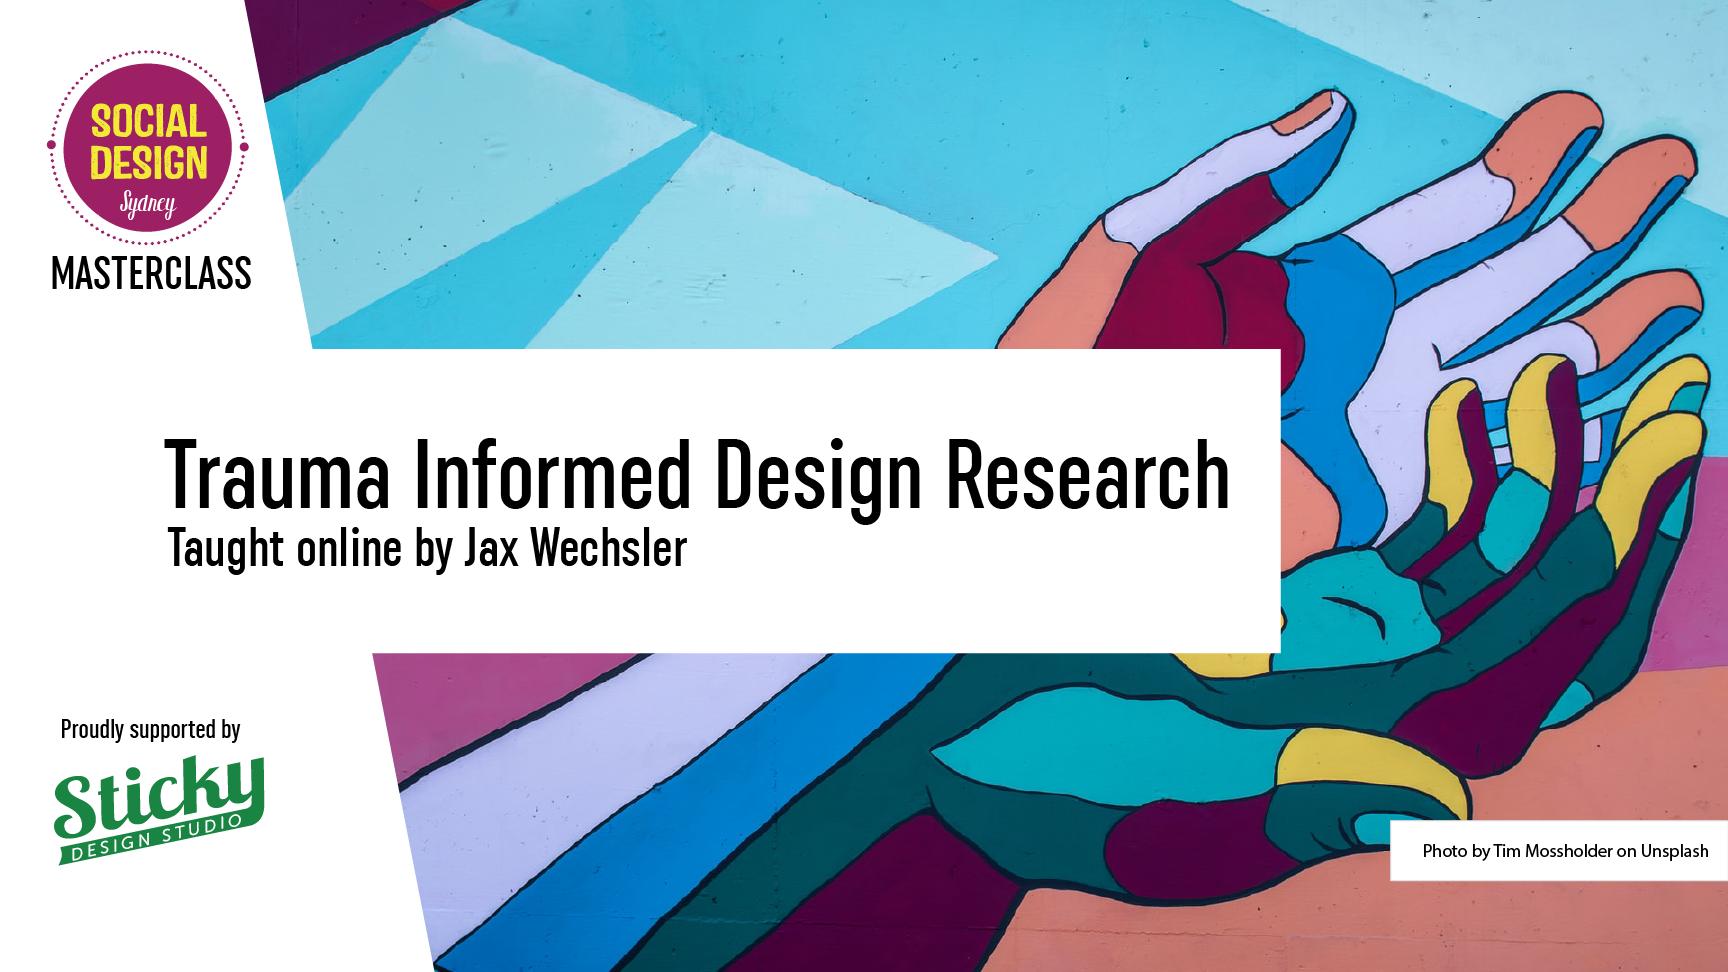 Trauma Informed Design Research